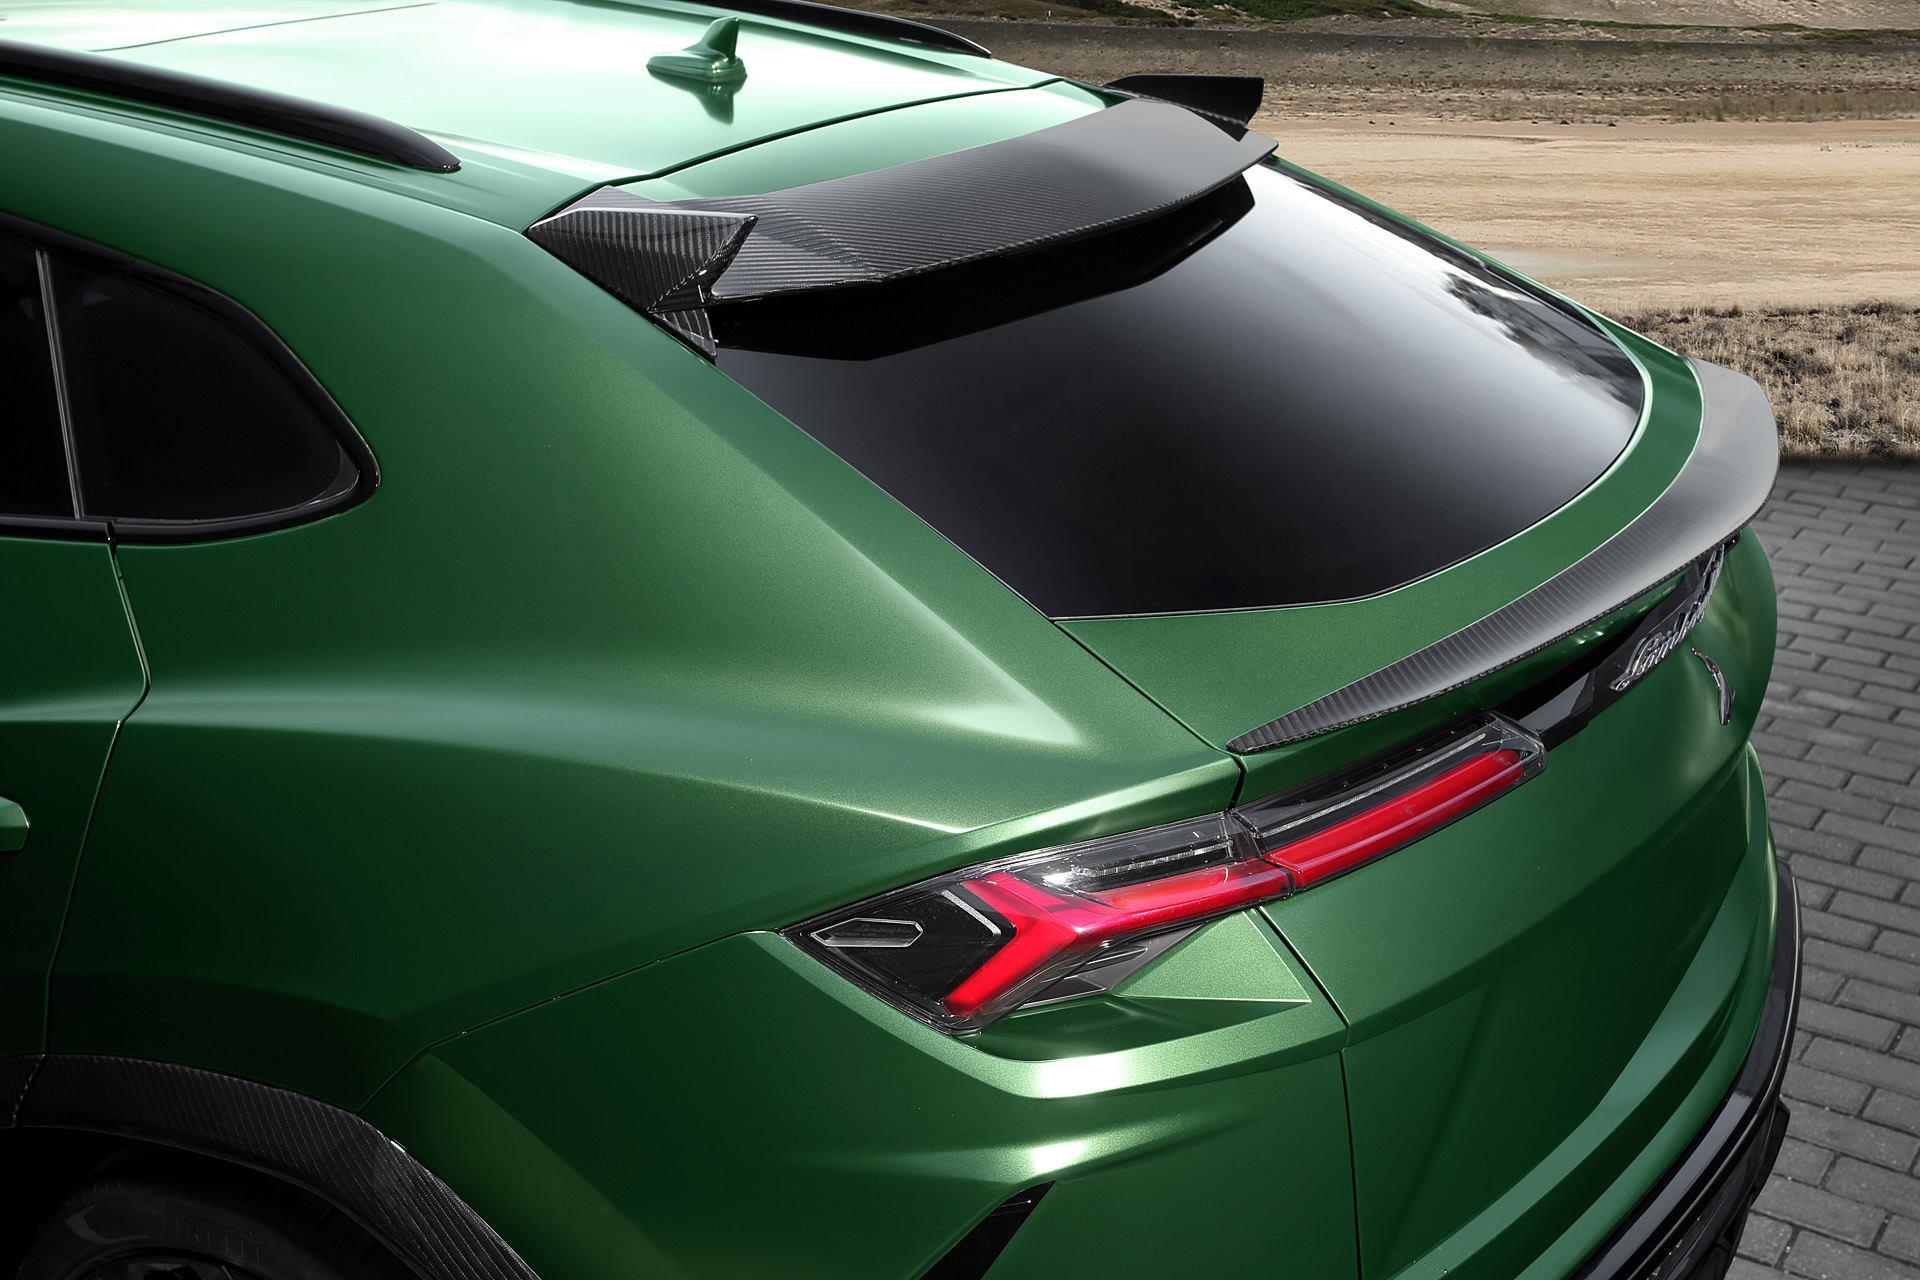 Topcar Lamborghini Urus Revealed With Military Green Paint And Camo